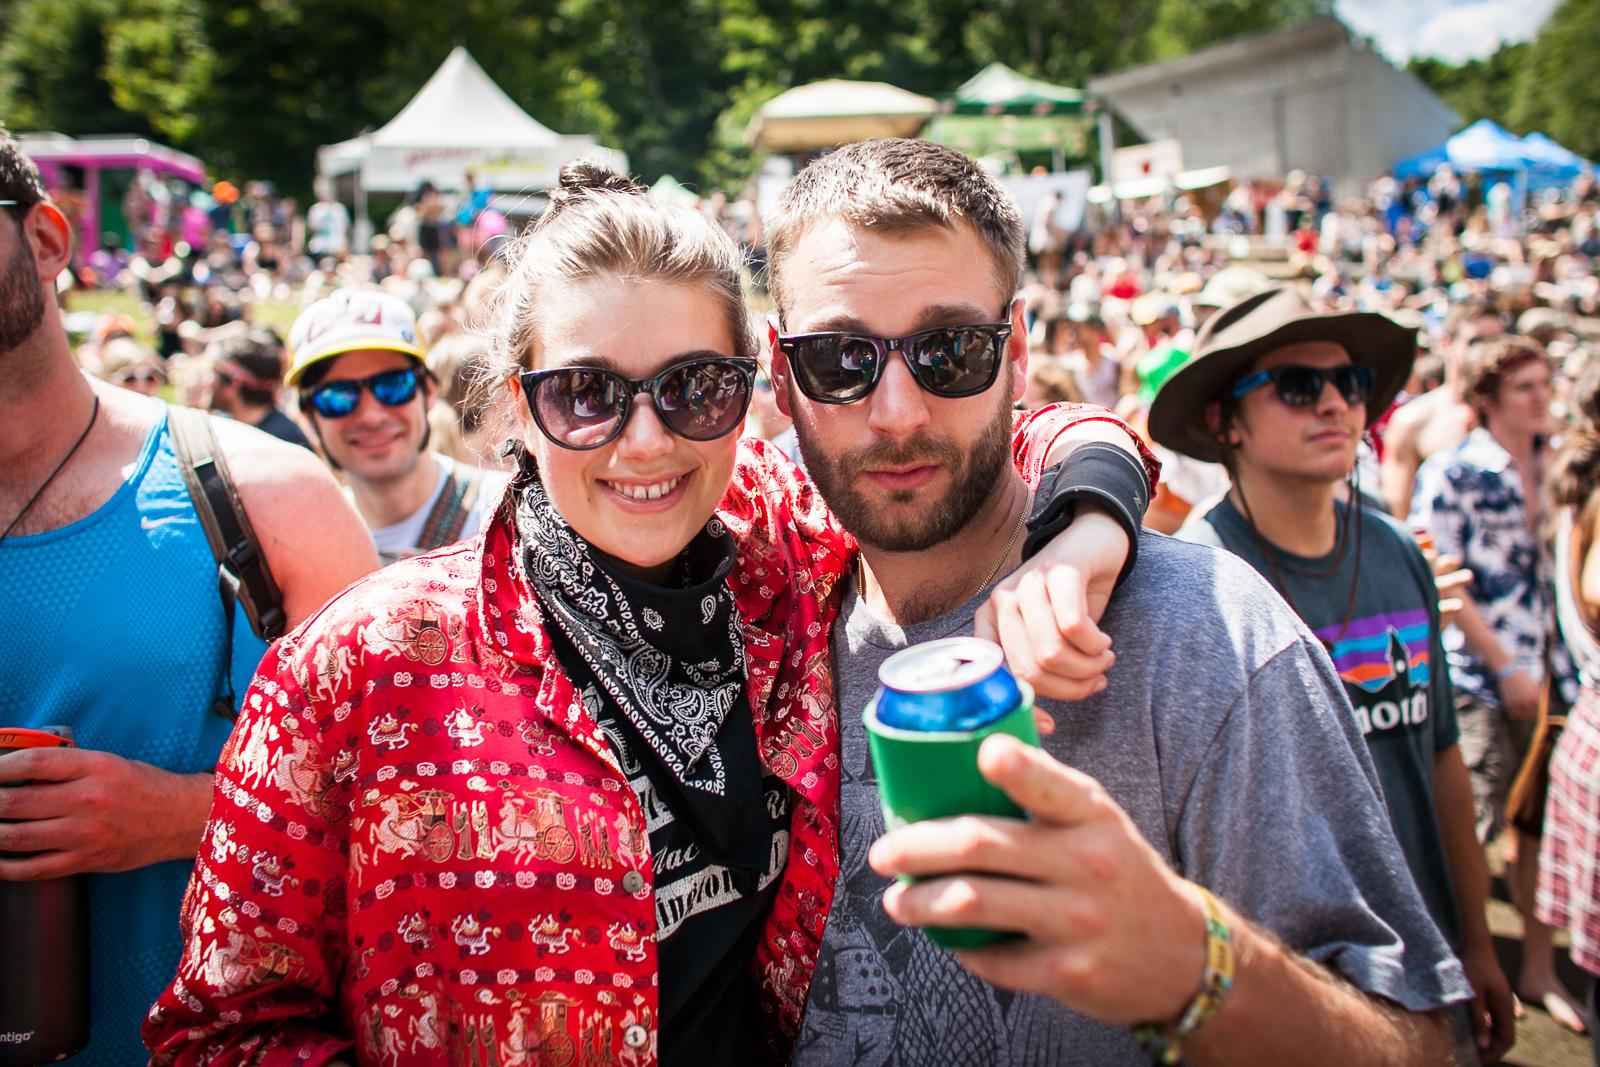 Frendly Gathering festival at Timber Ridge Resort in June 2015.